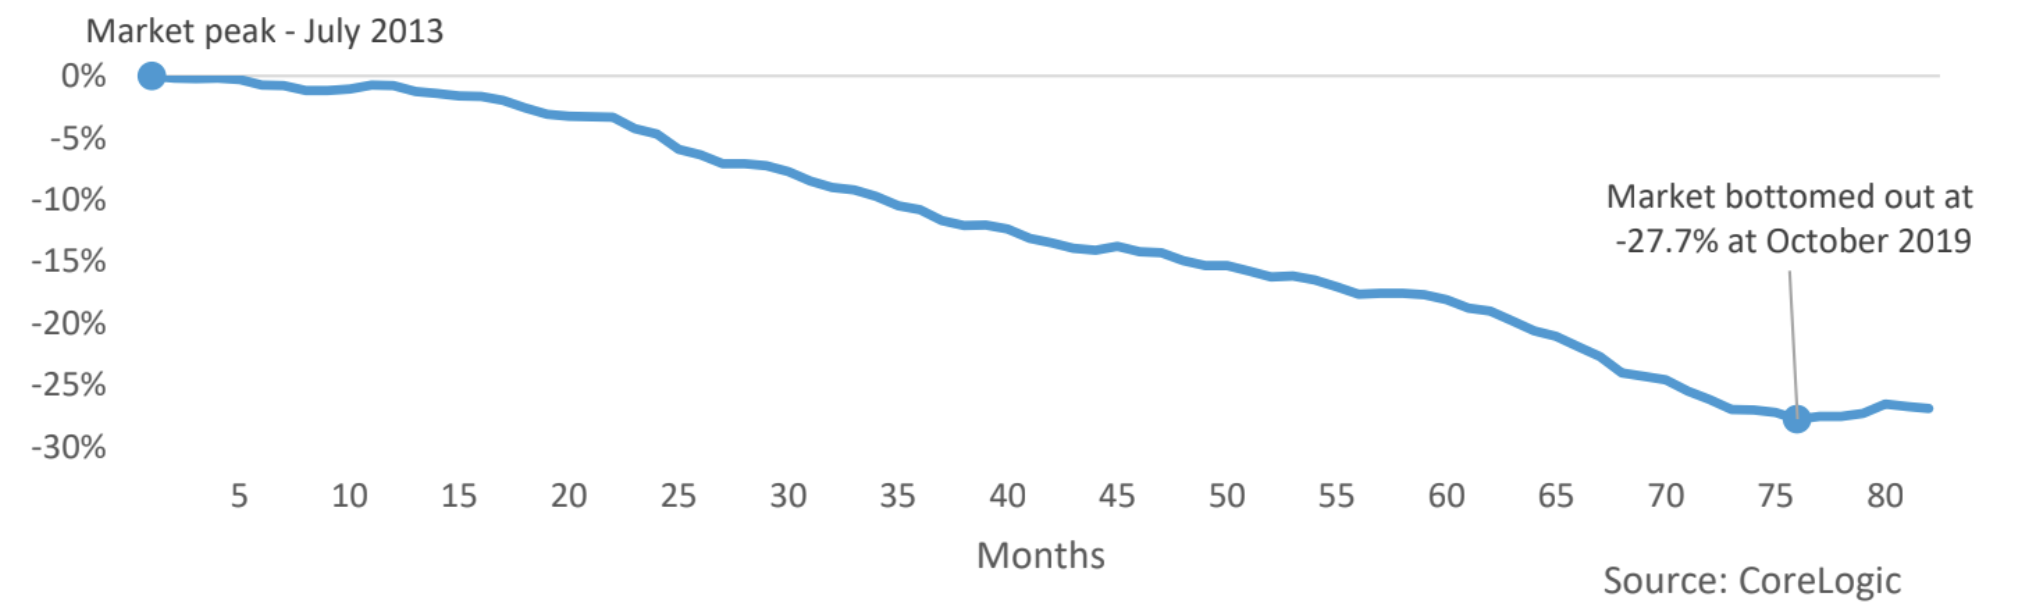 Perth unit market - value change relative to peak